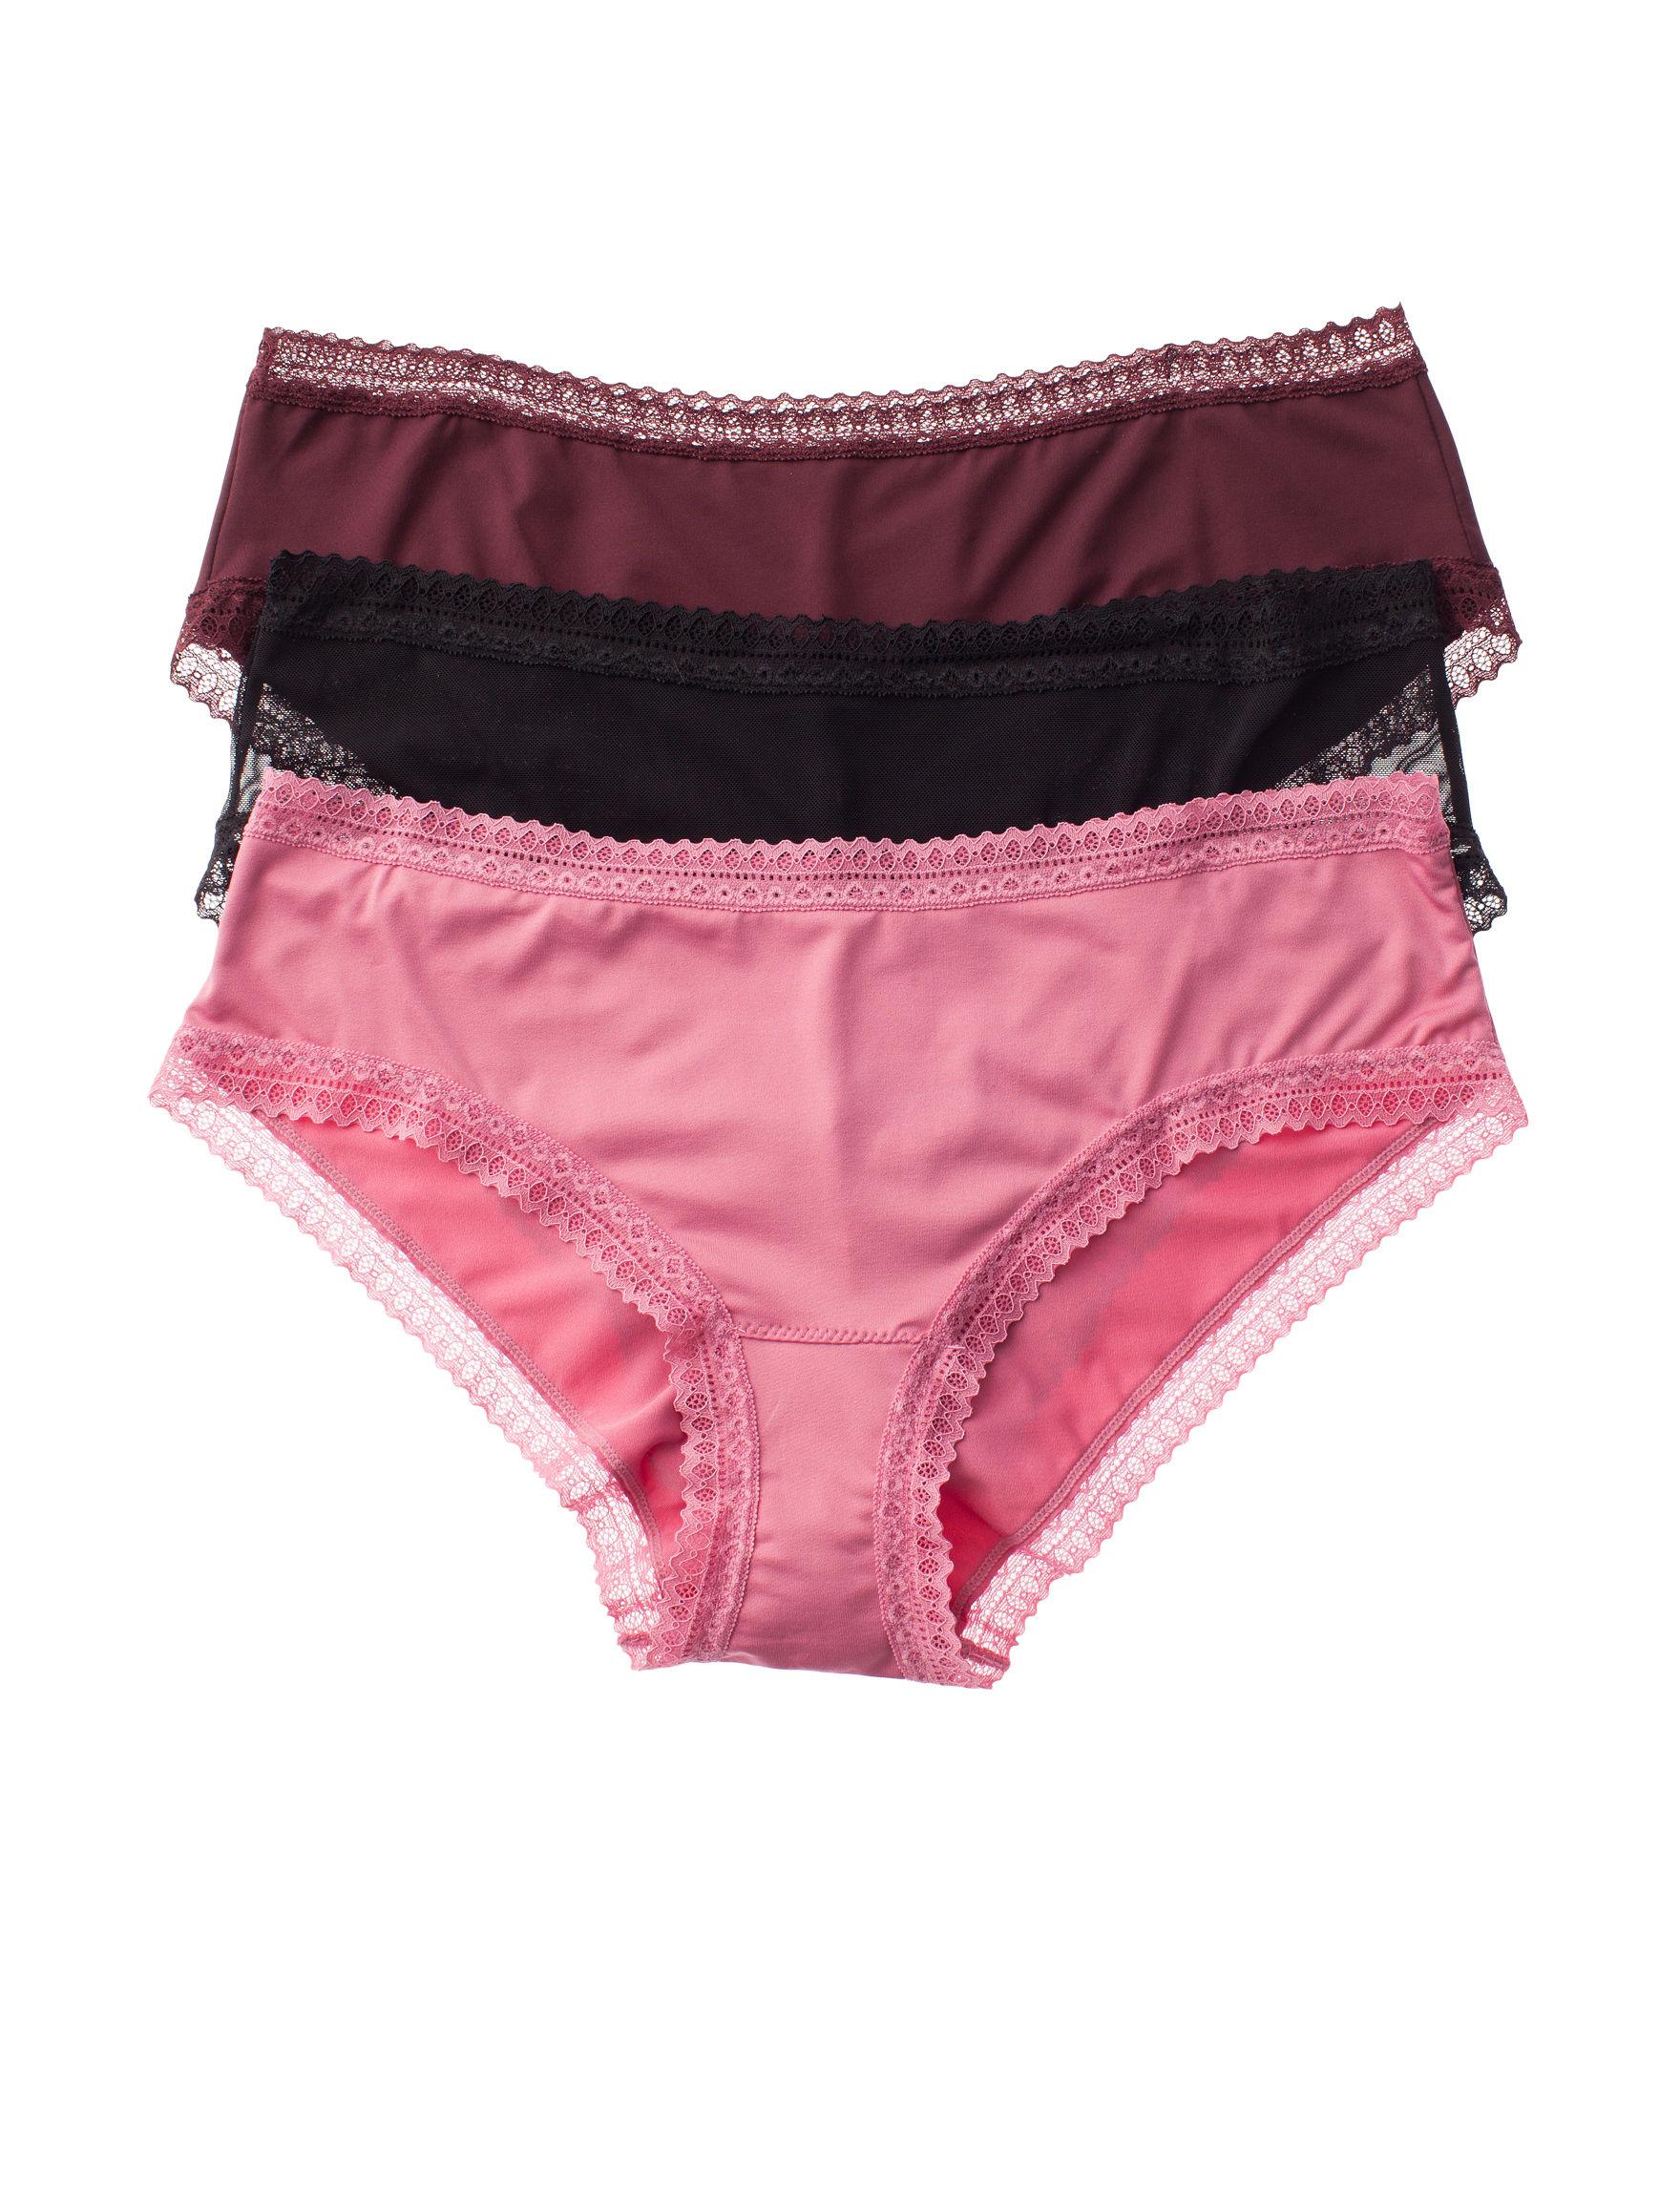 Rene Rofe Multi Panties Hipster